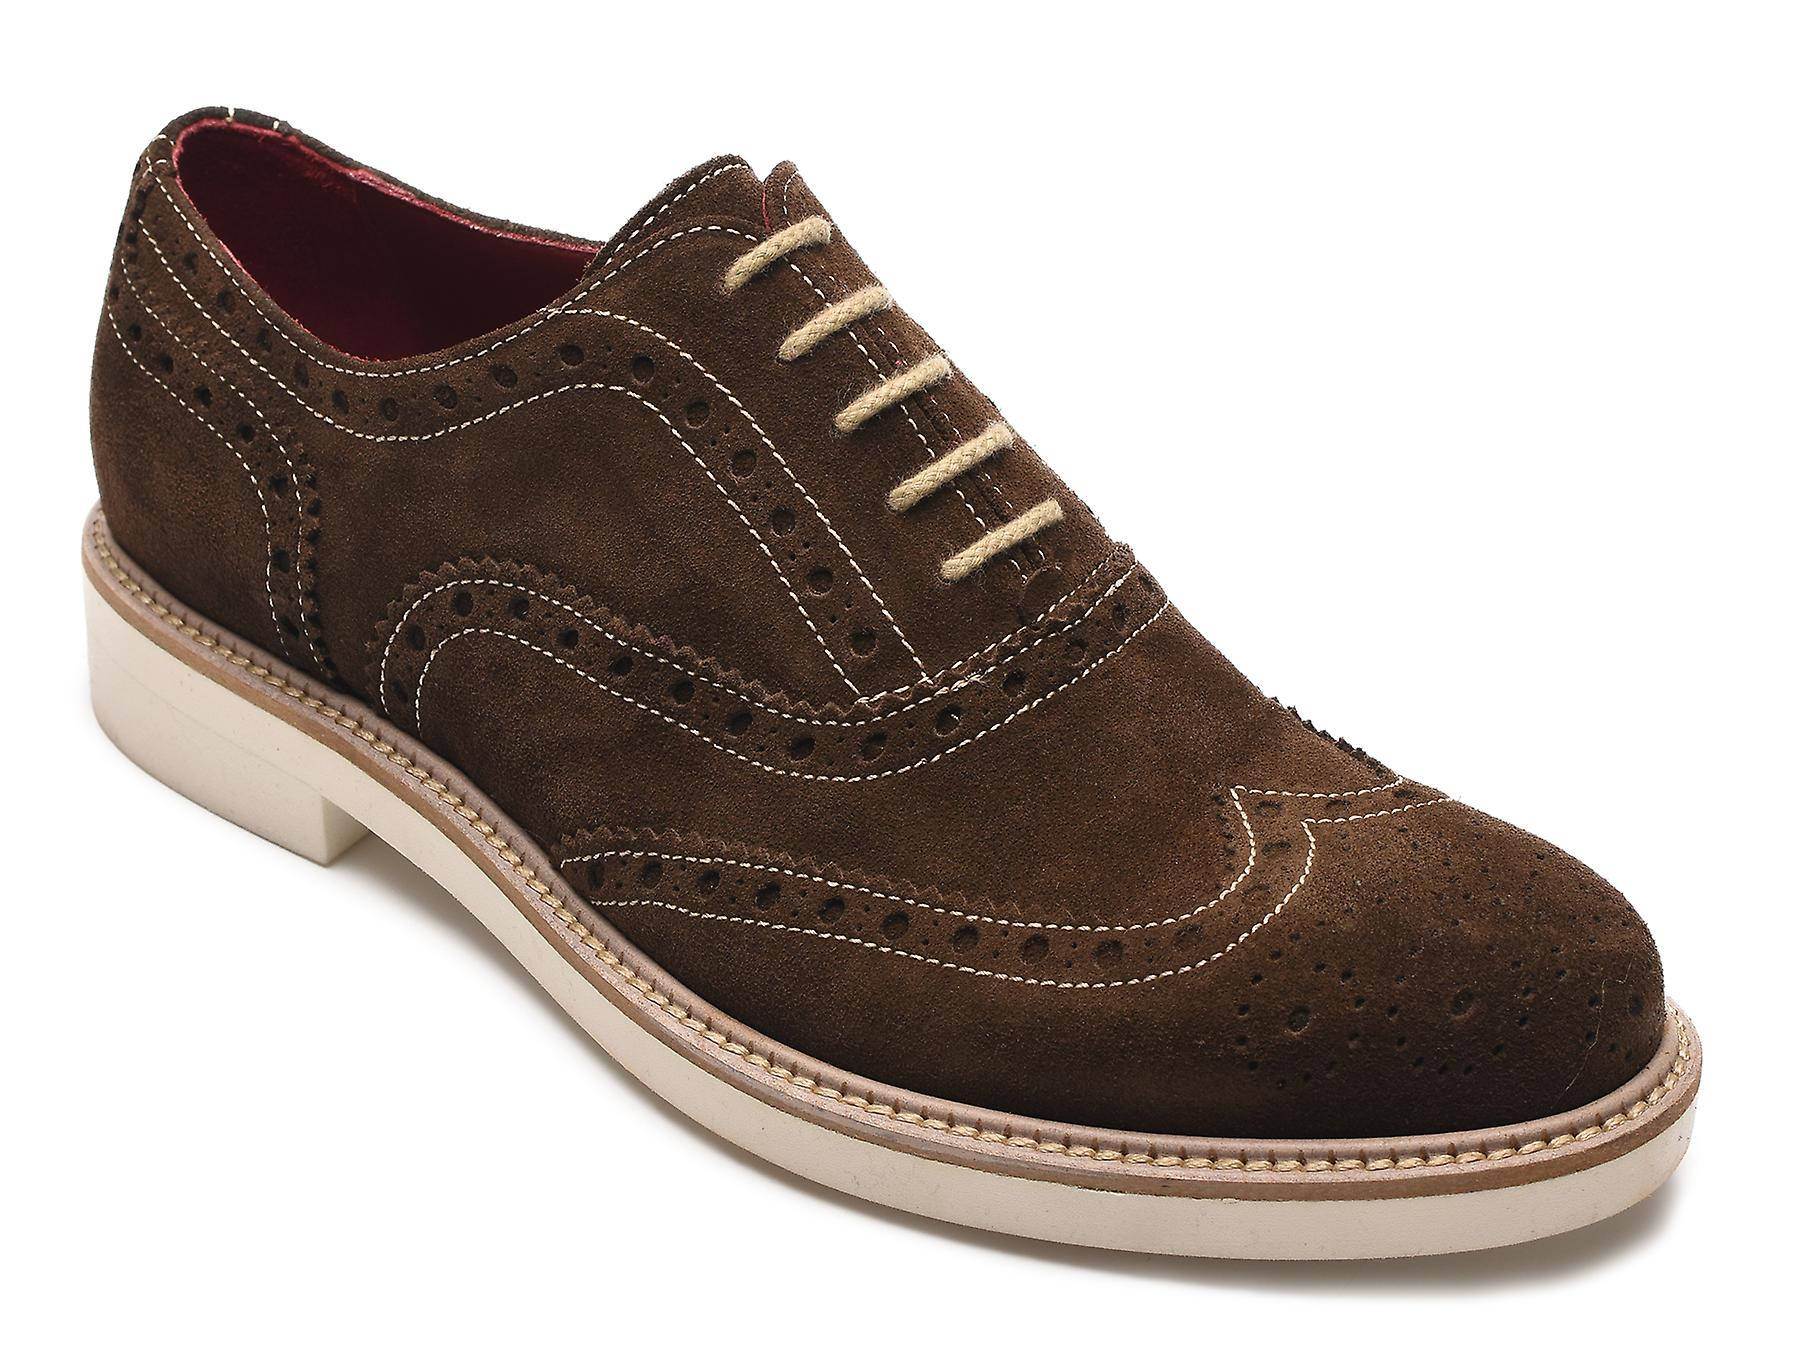 e5b0af65c24637 Alexander Men s Jargo Suede Leather Brogue Oxfords Shoes Dark Brown ...